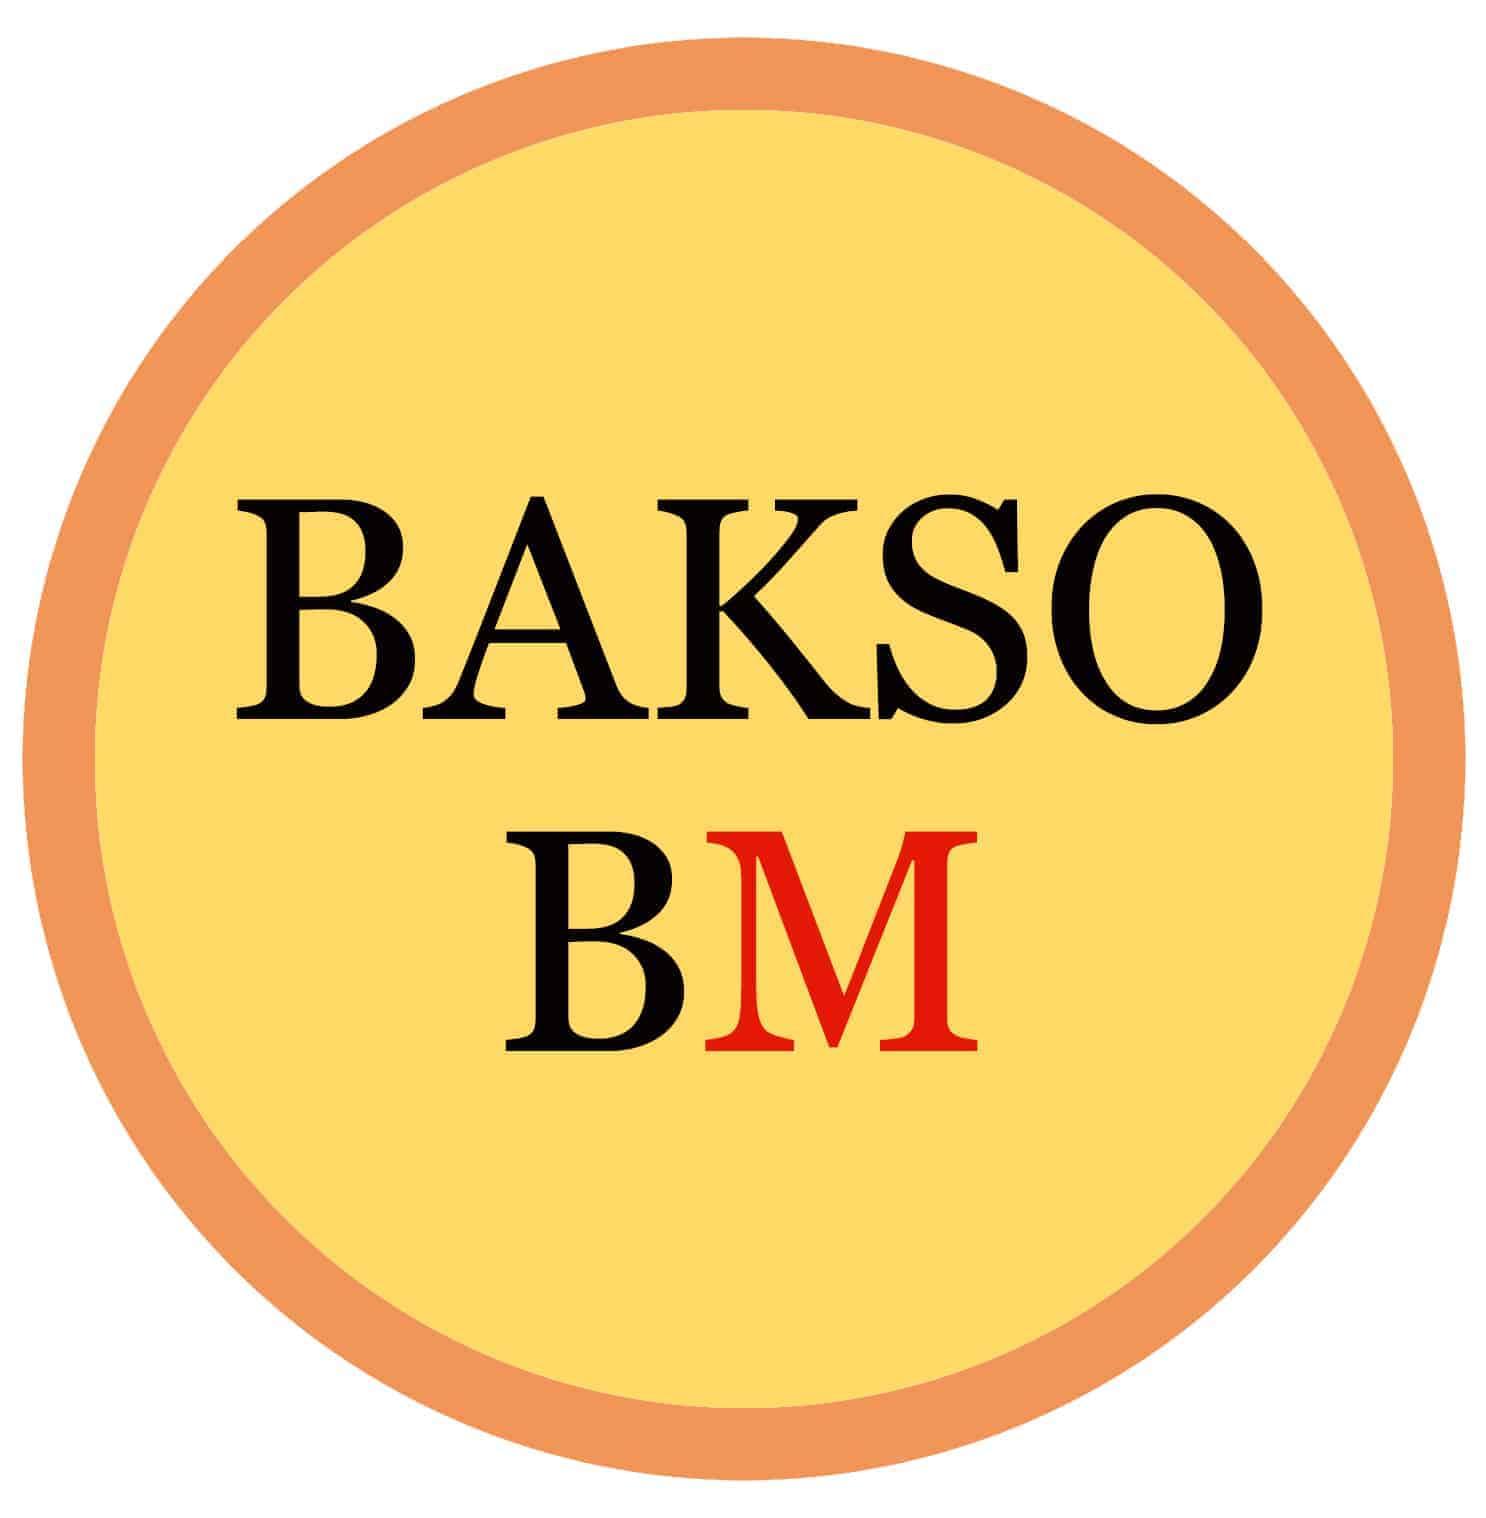 Bakso BM Bali